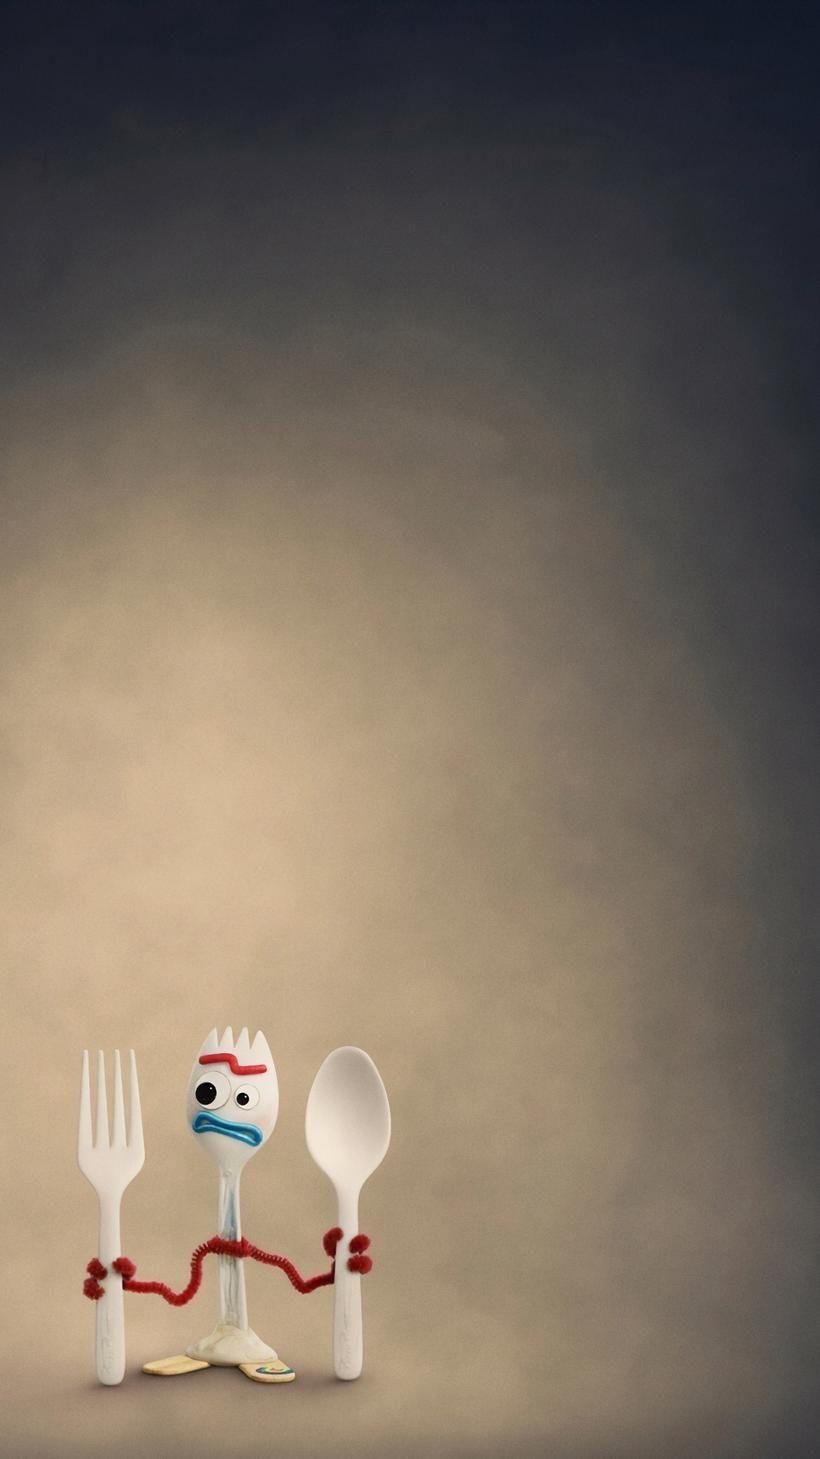 Toy Story 4 2019 Phone Wallpaper Fondo De Pantalla Iphone Disney Fondos De Pantalla De Peliculas Fondos De Pantalla De Iphone